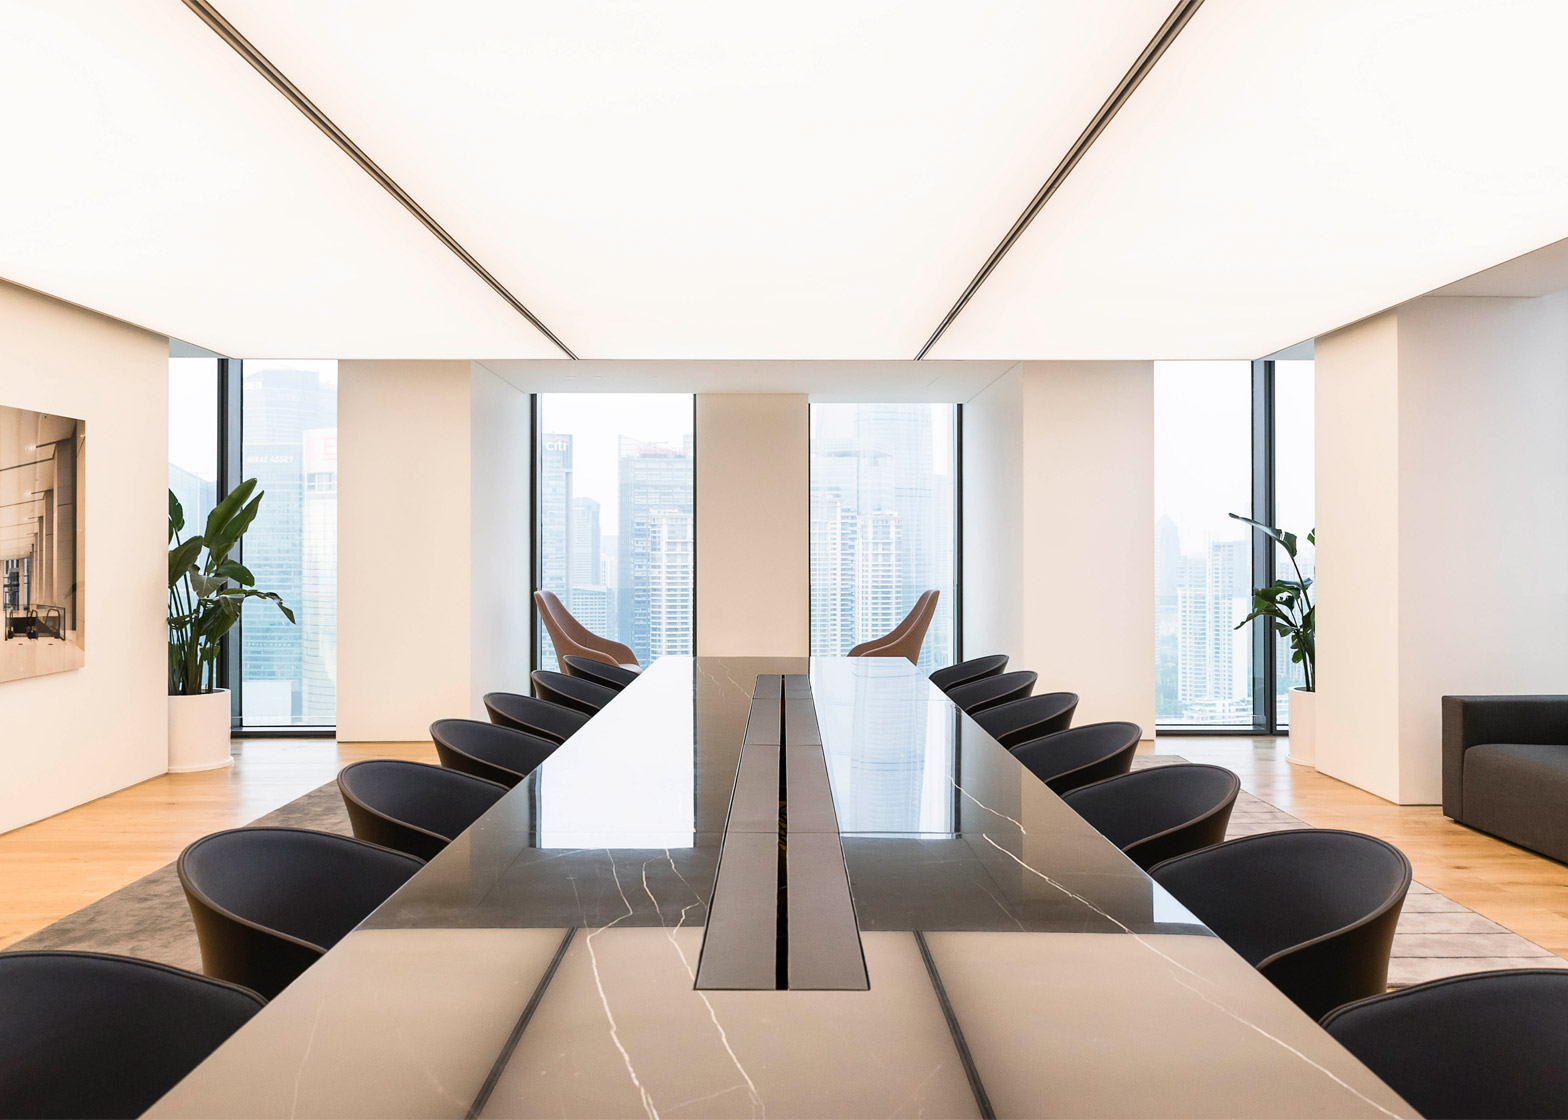 Aim Architecture designs timeless interior for Soho Bund hotel in Shanghai